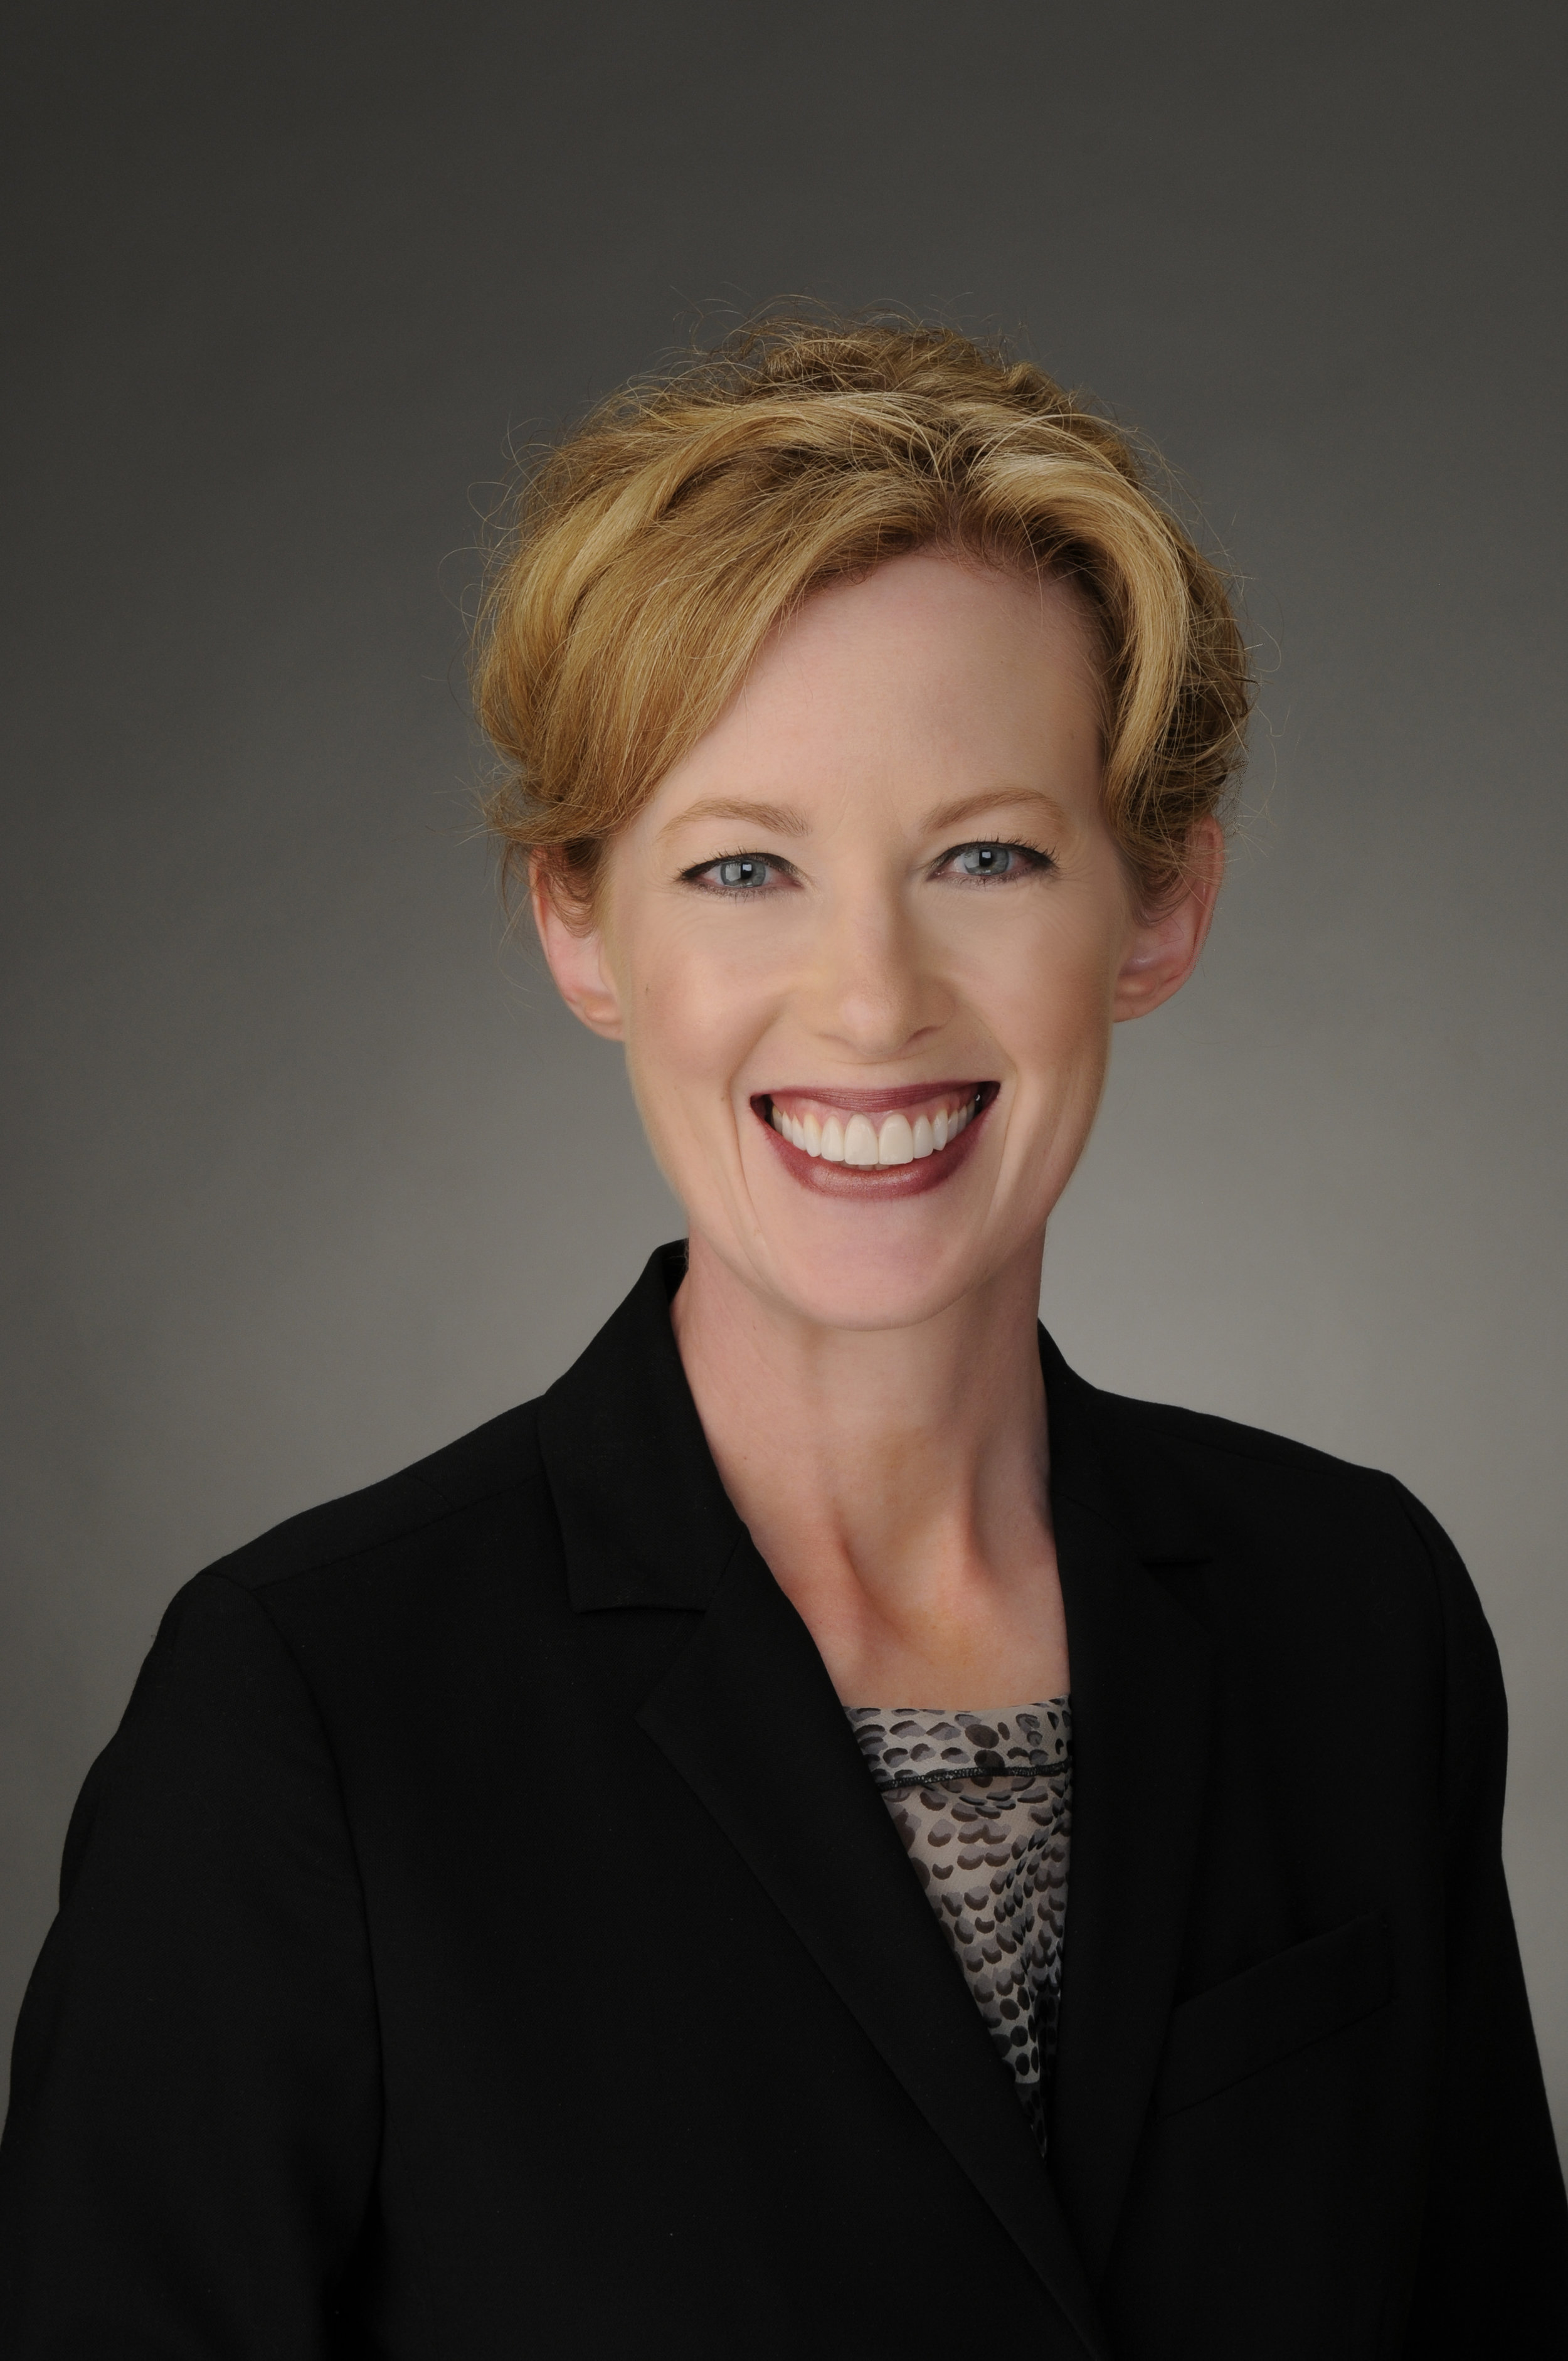 Kirsten lynch , EVP,CMO, Vail Resorts